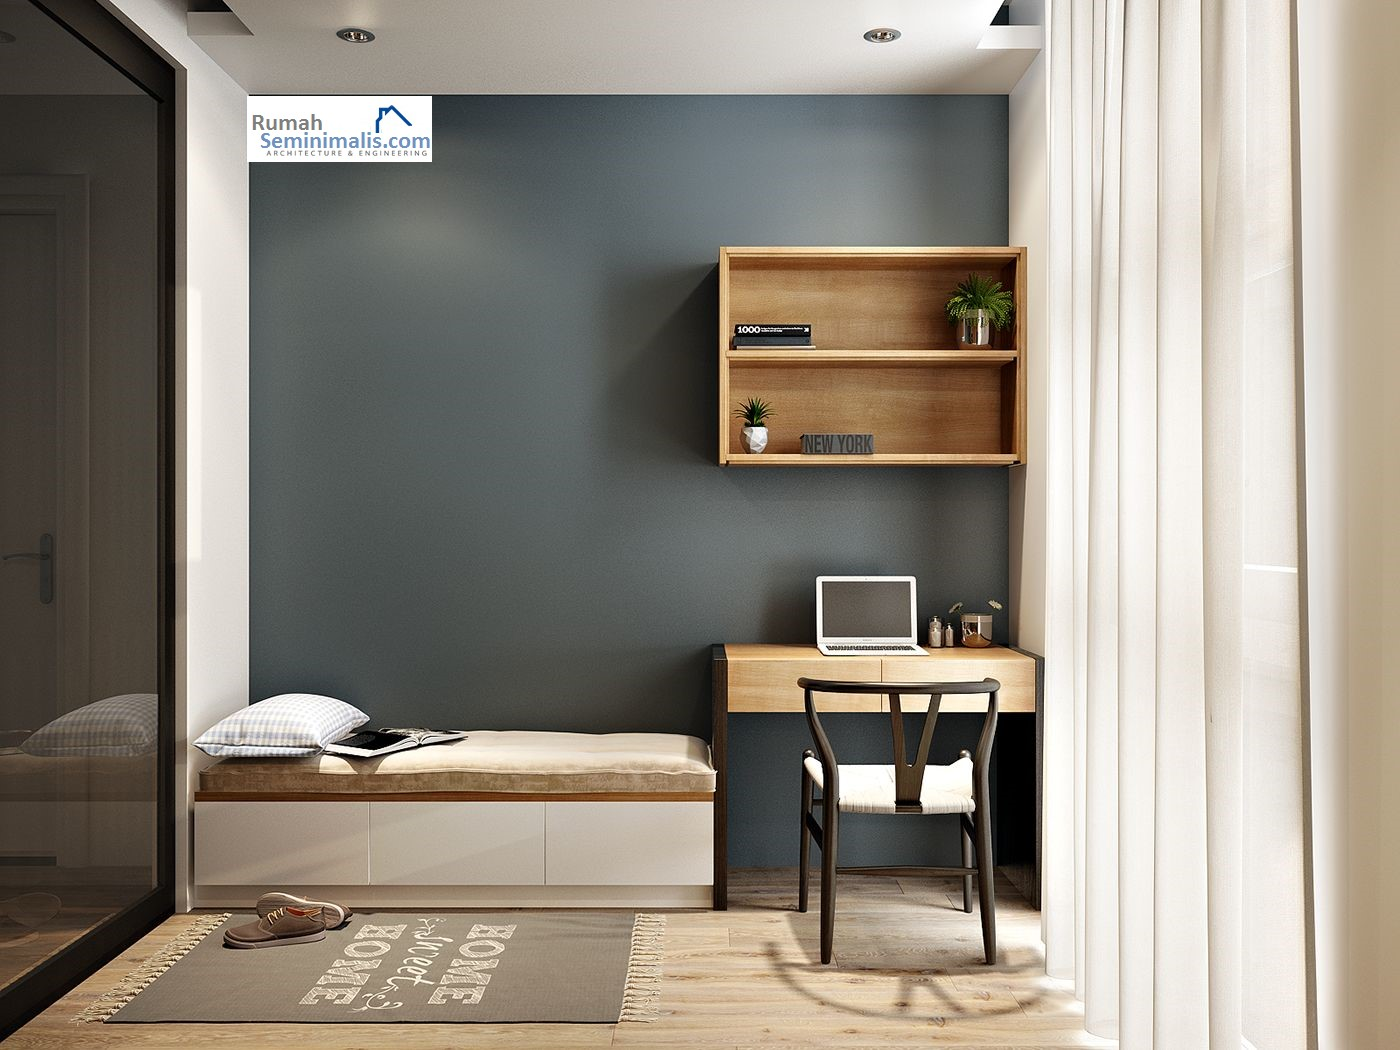 24 desain kamar tidur minimalis sederhana